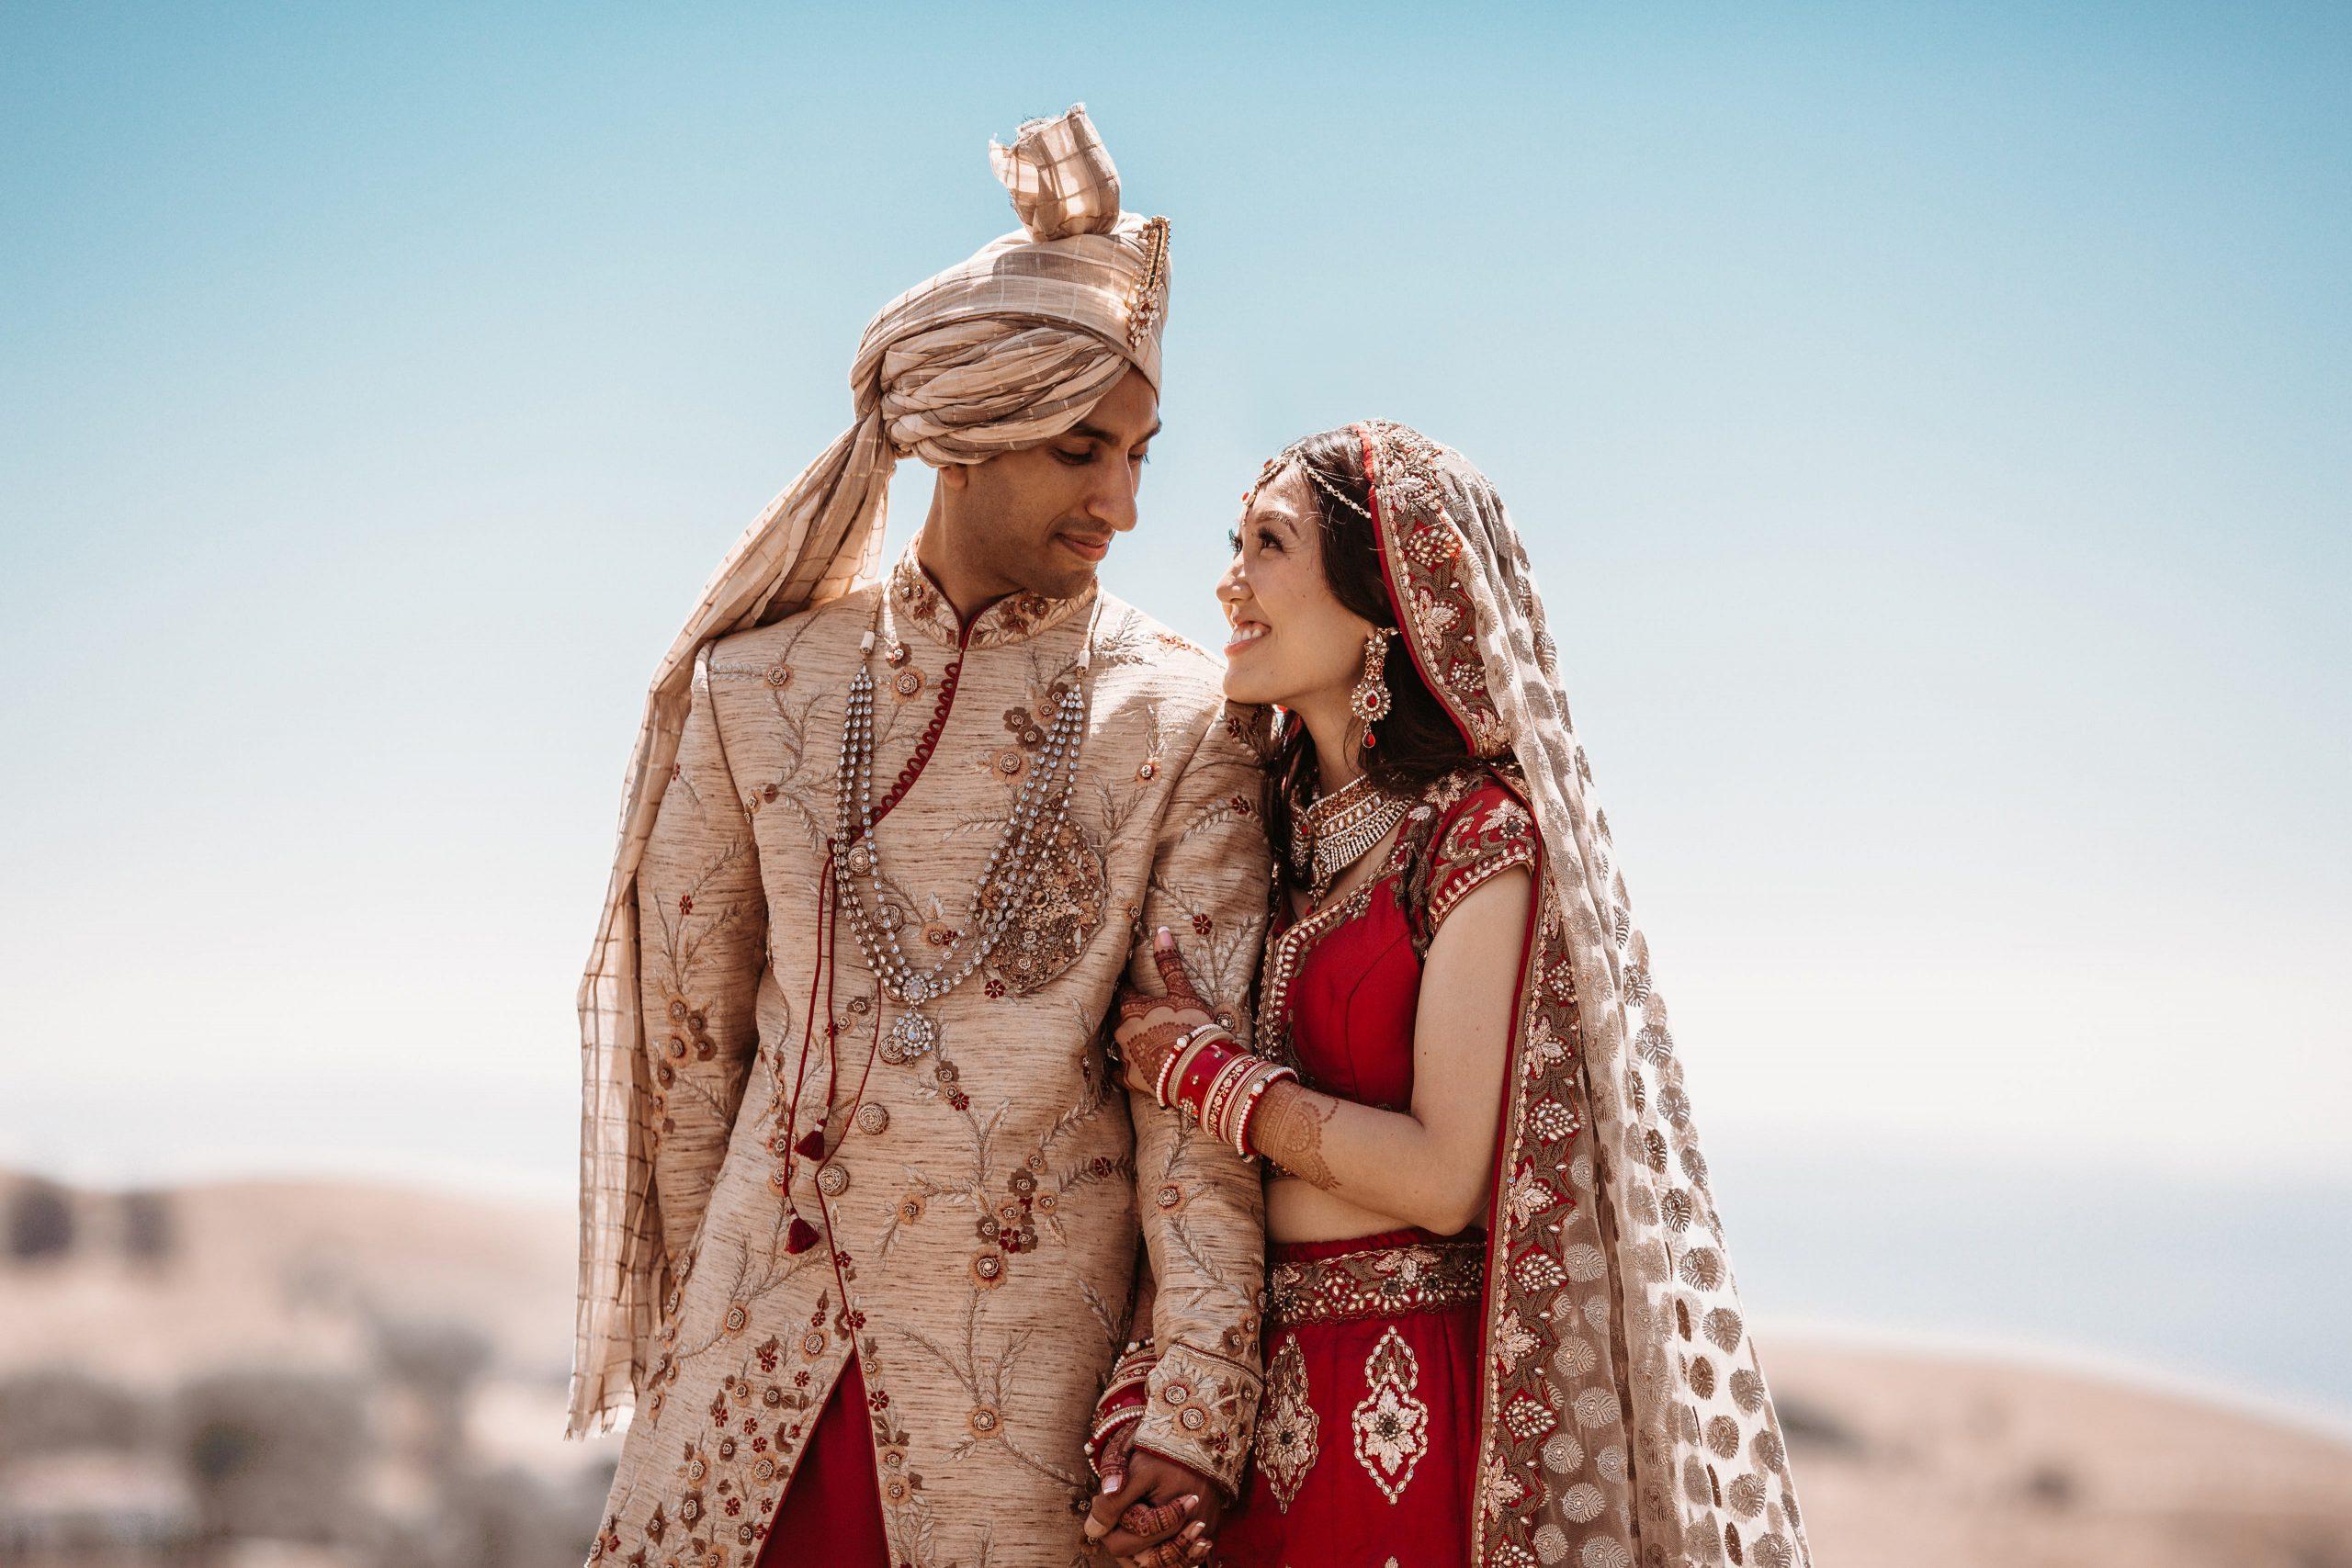 Indian & Vietnamese Wedding | Katherine & Harsh | Saratoga Springs Wedding | LifeStory.Film